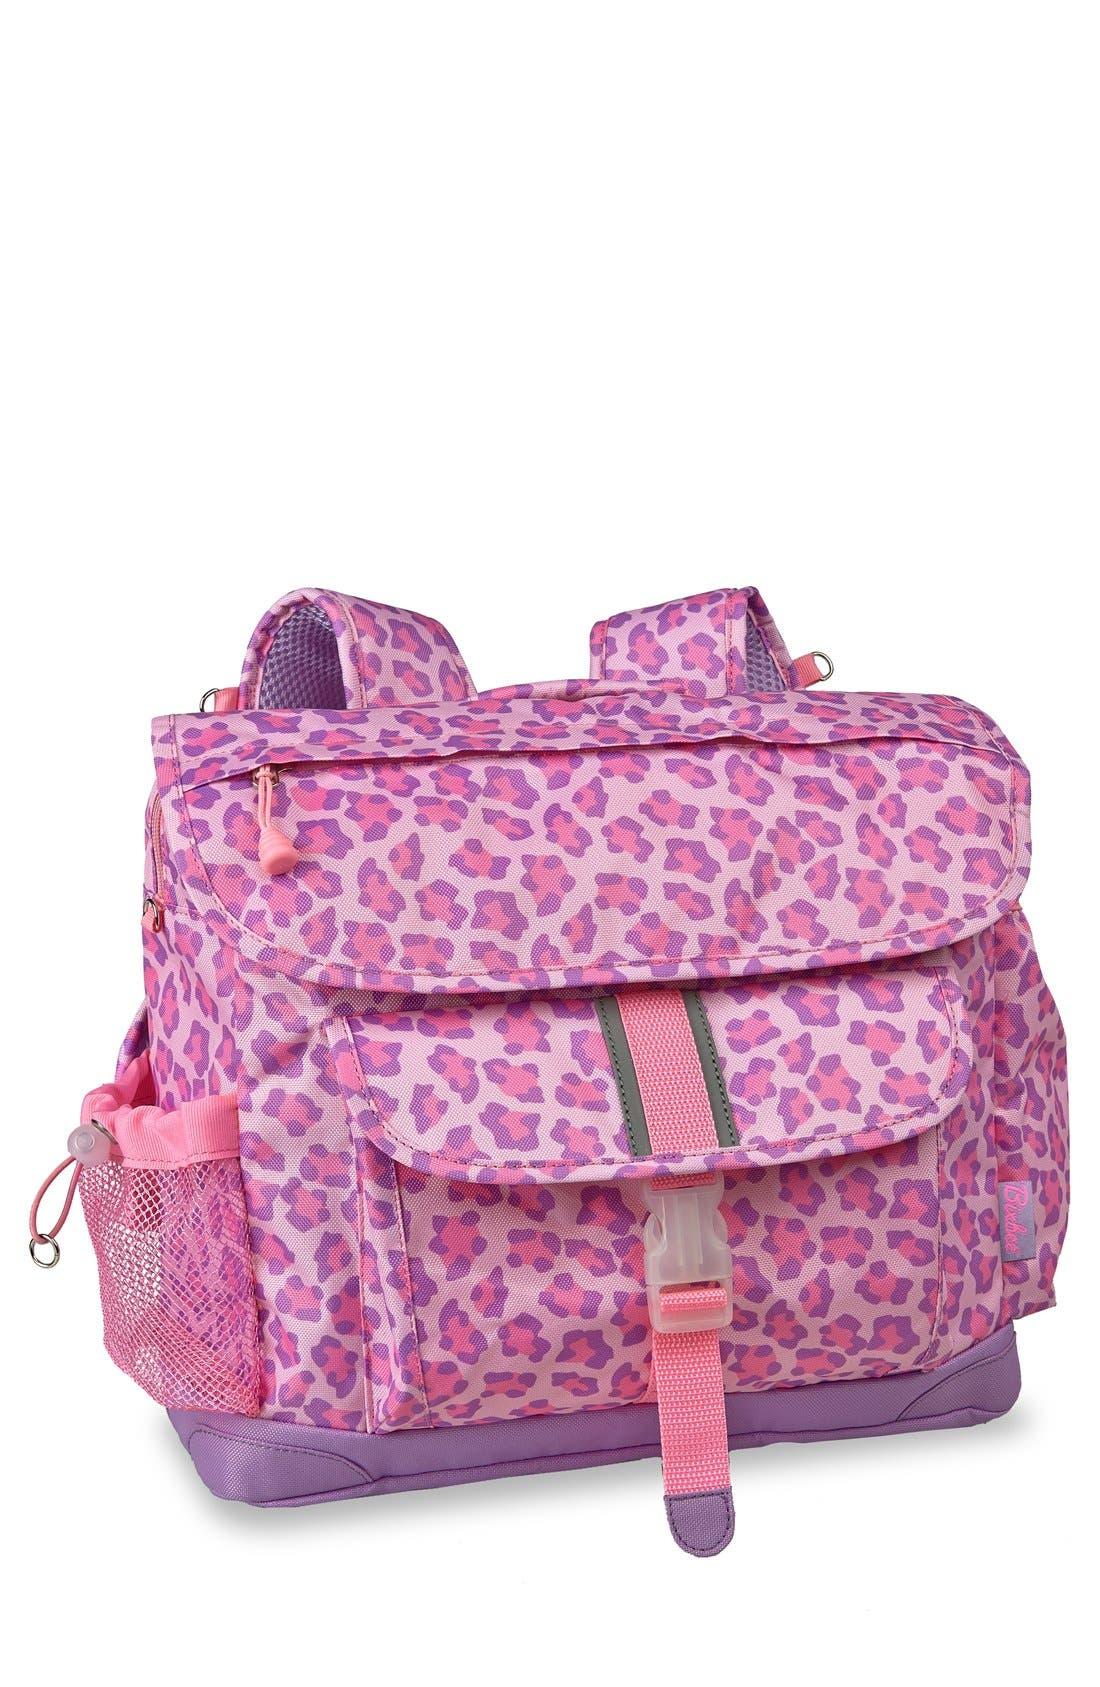 BIXBEE 'Large Sassy Spots' Leopard Print Backpack